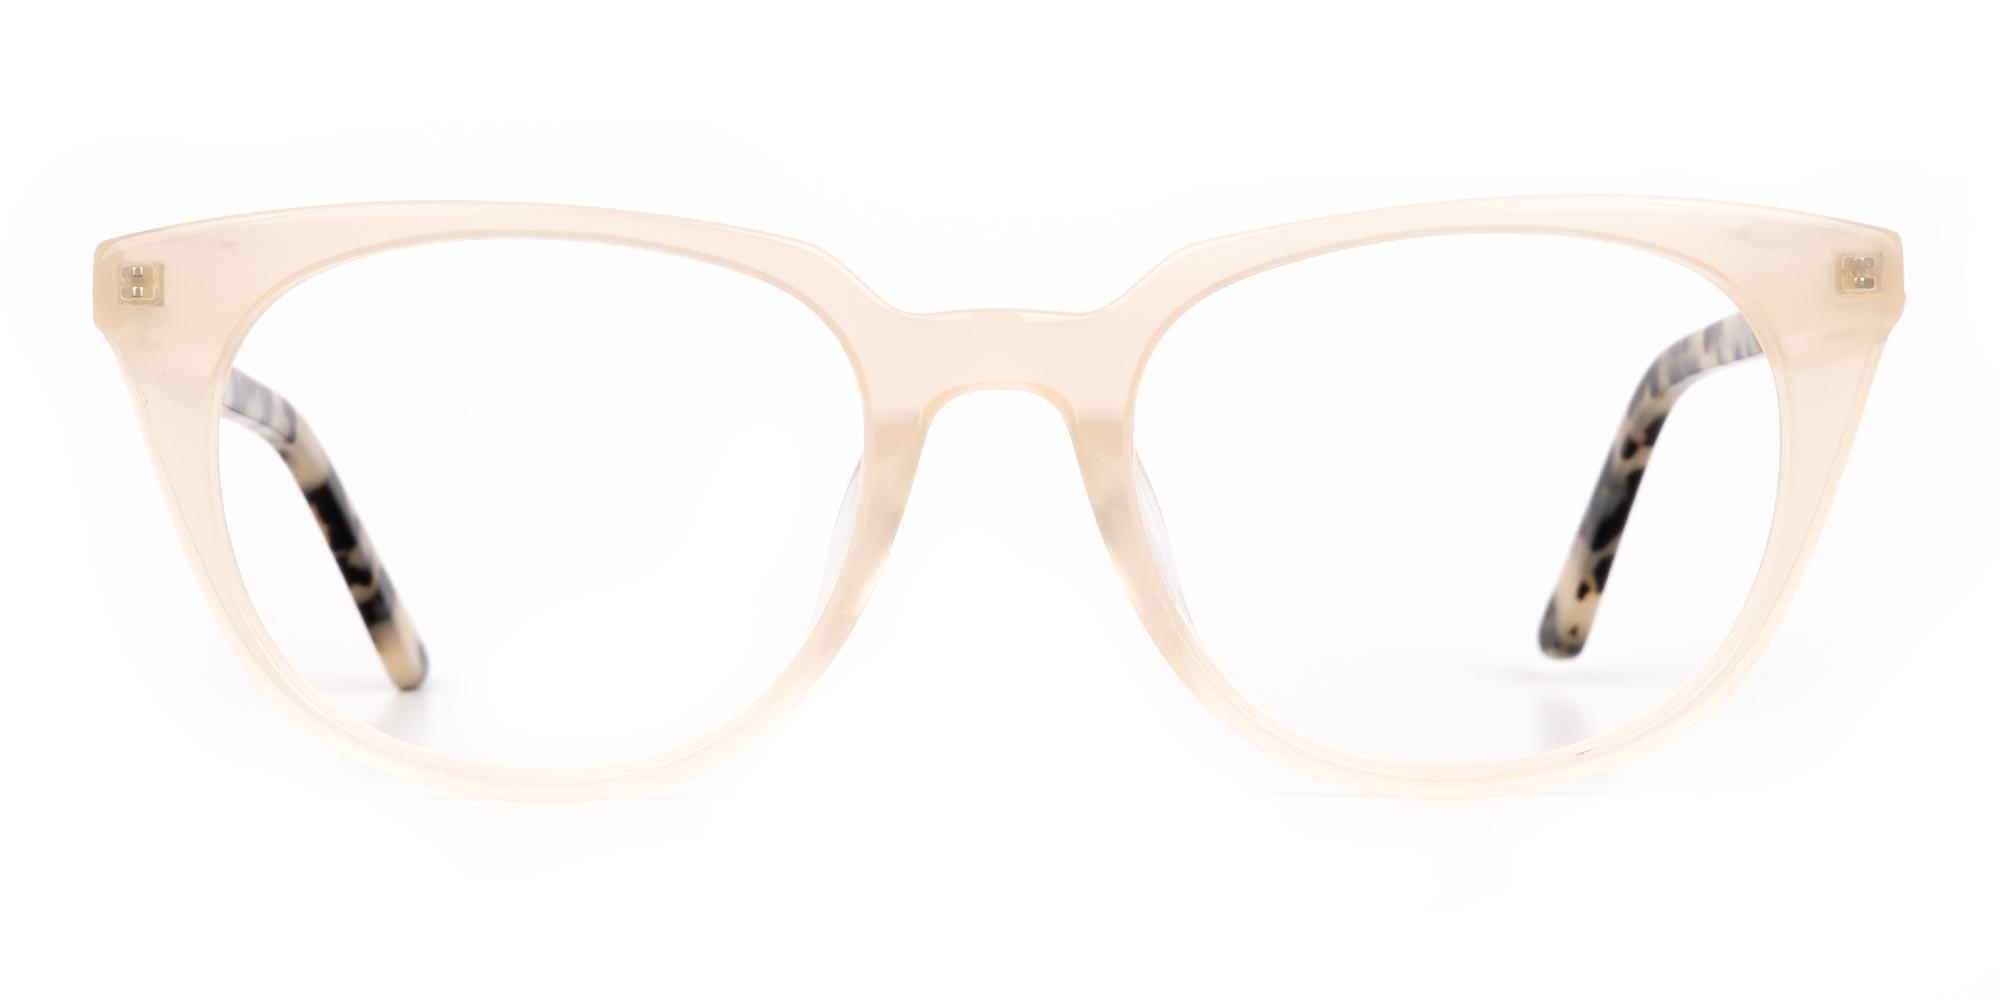 Creamy Brown Translucent Glasses